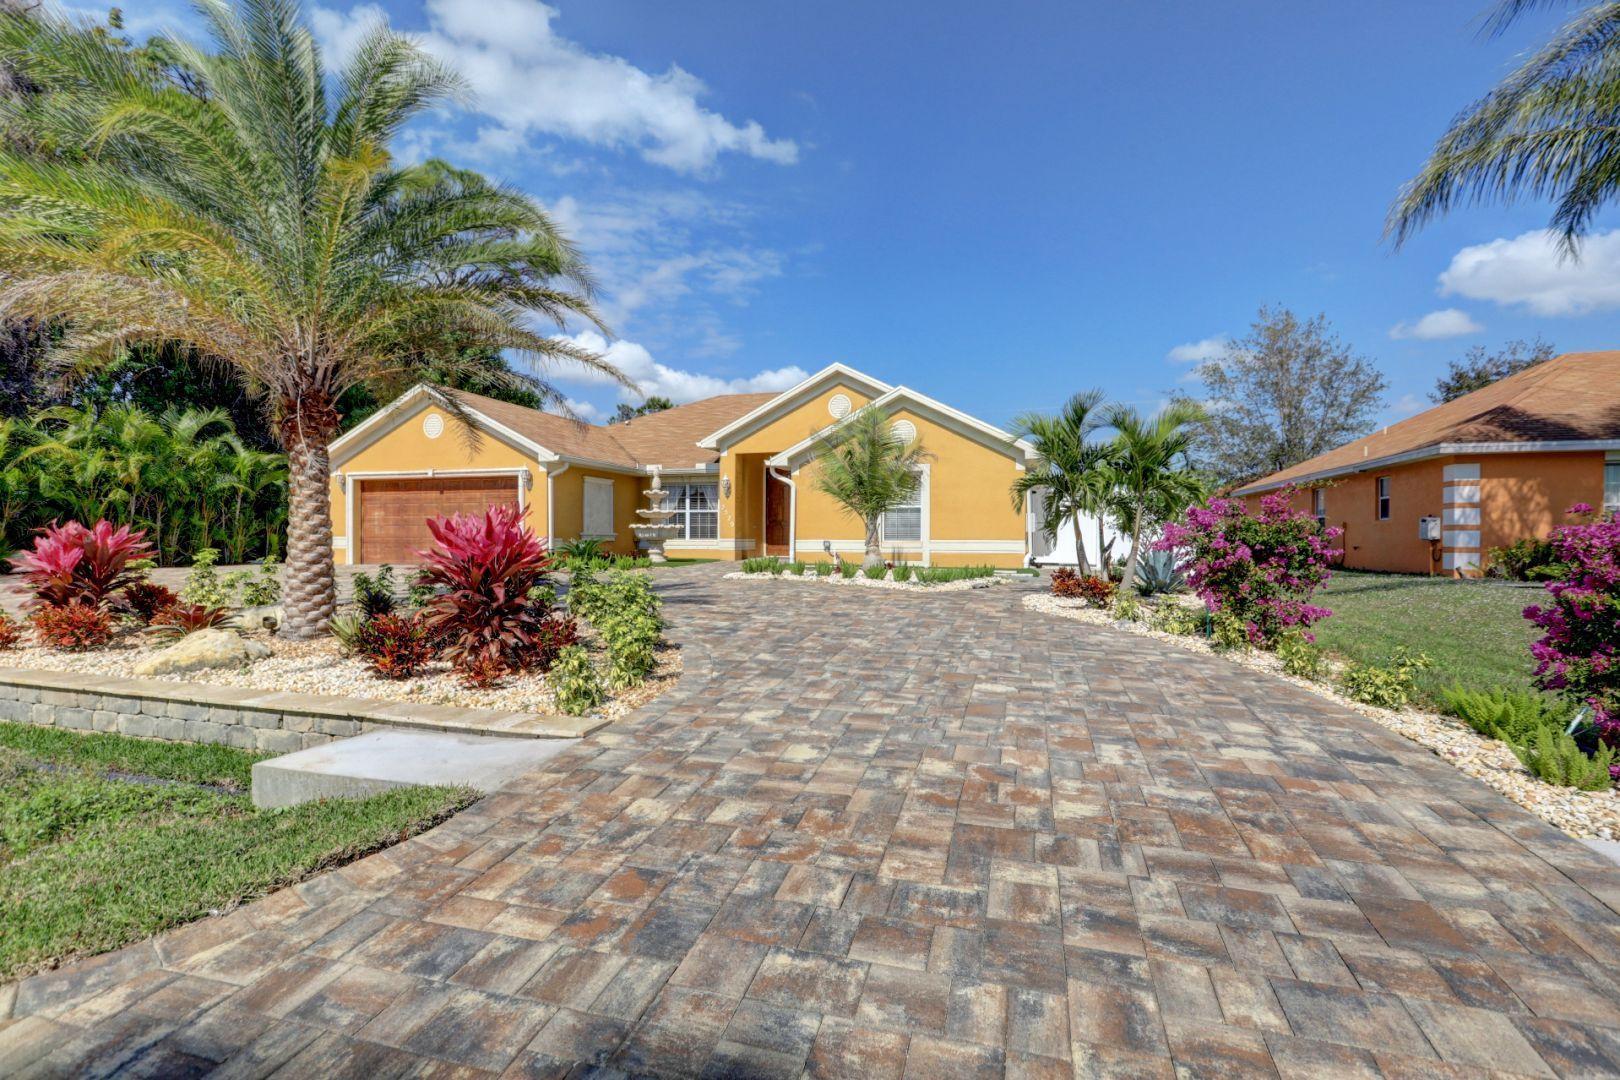 2529 Sw Grotto Circle, Port Saint Lucie, FL 34953